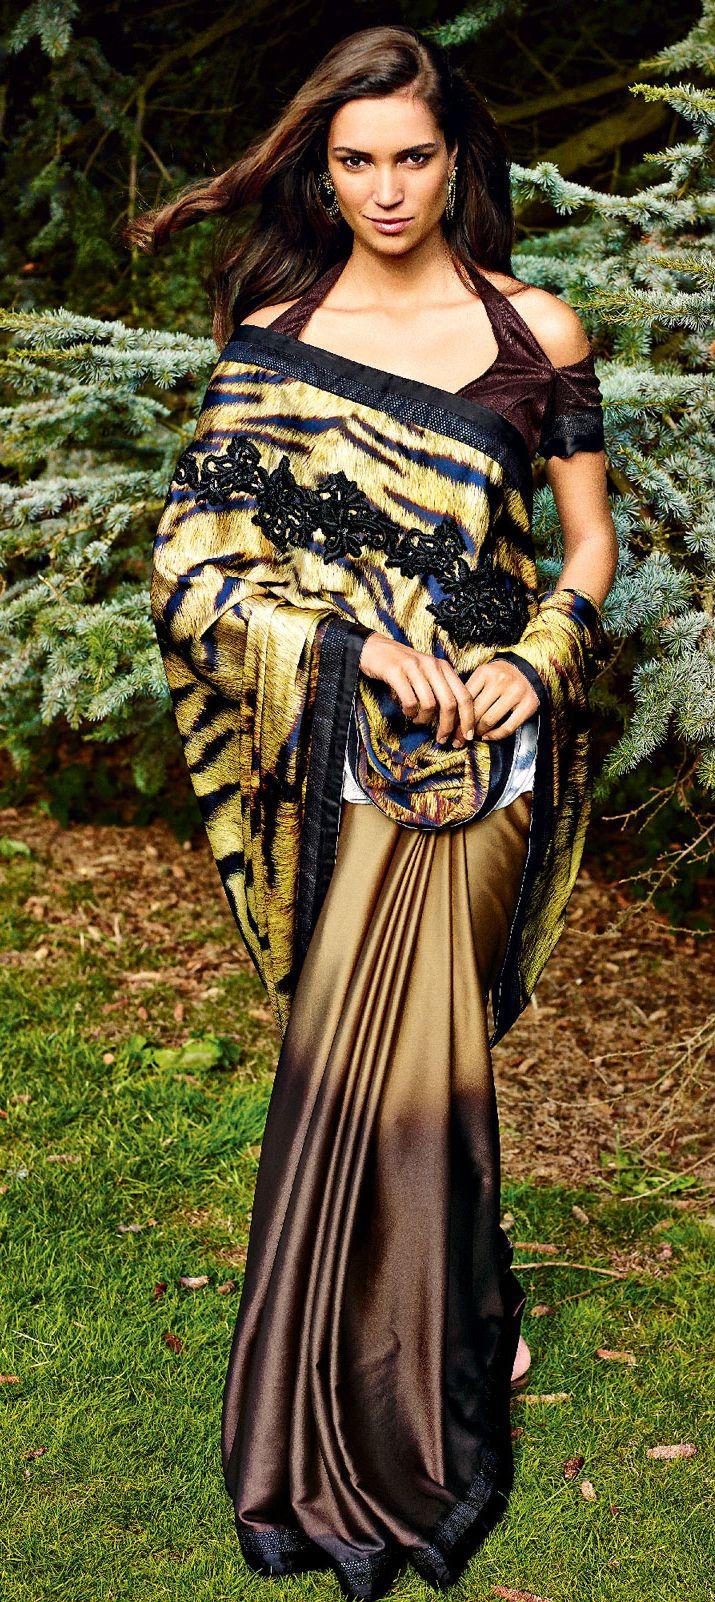 154805: TIGRESS OF THE JUNGLE. This #saree will make you on.  #AnimalPrints #IndianFashion #OnlineShopping #tigers